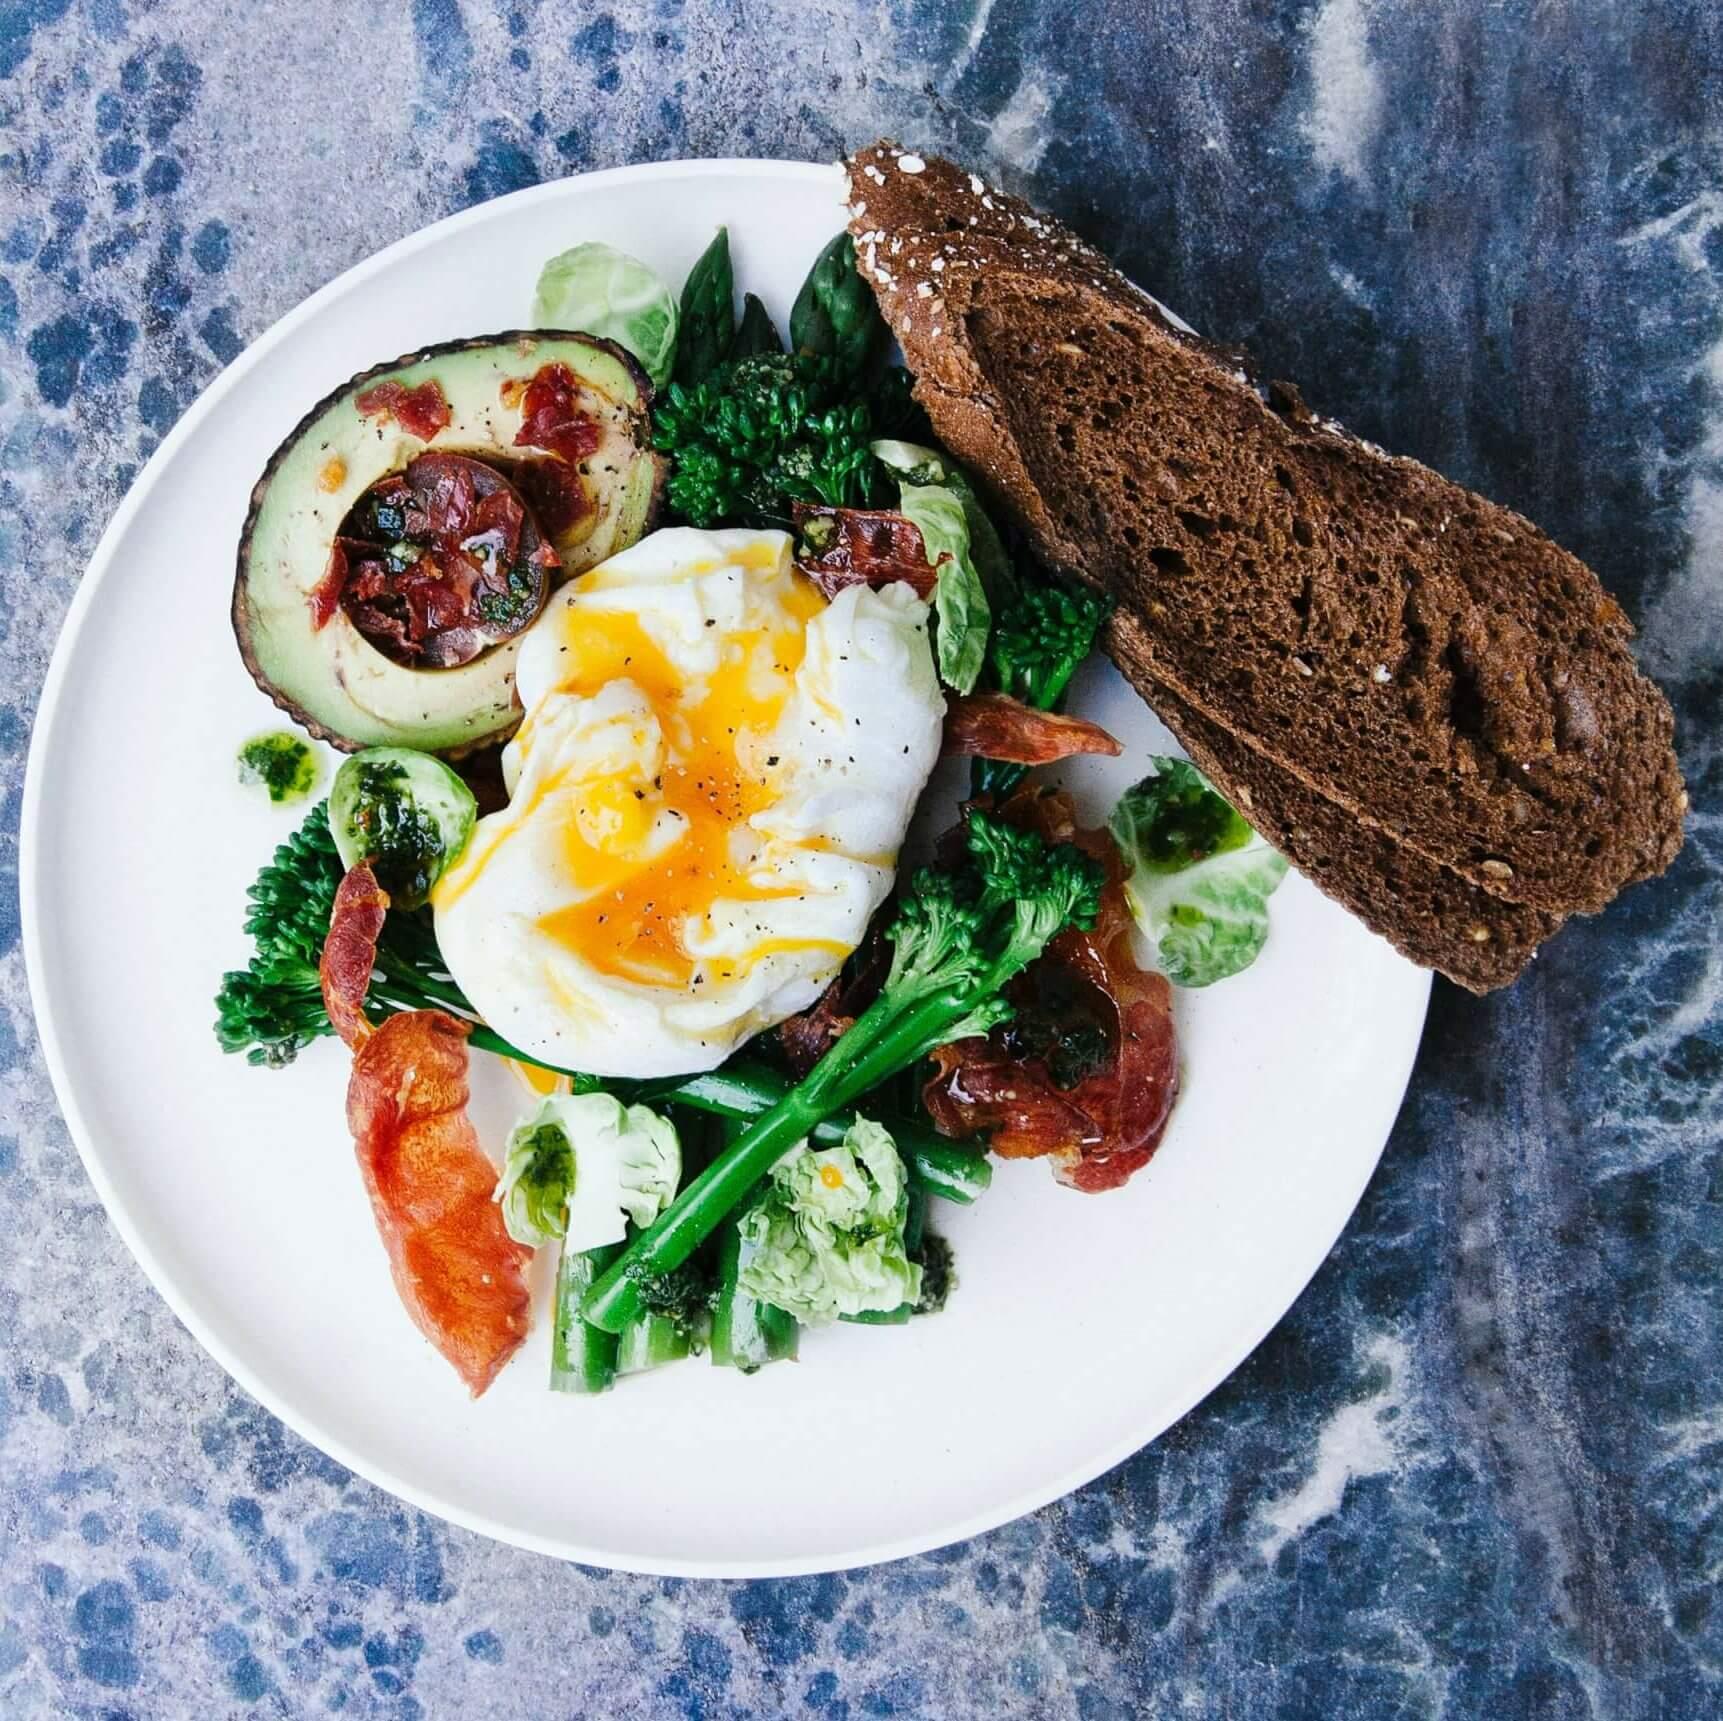 Skandinavisches Frühstück